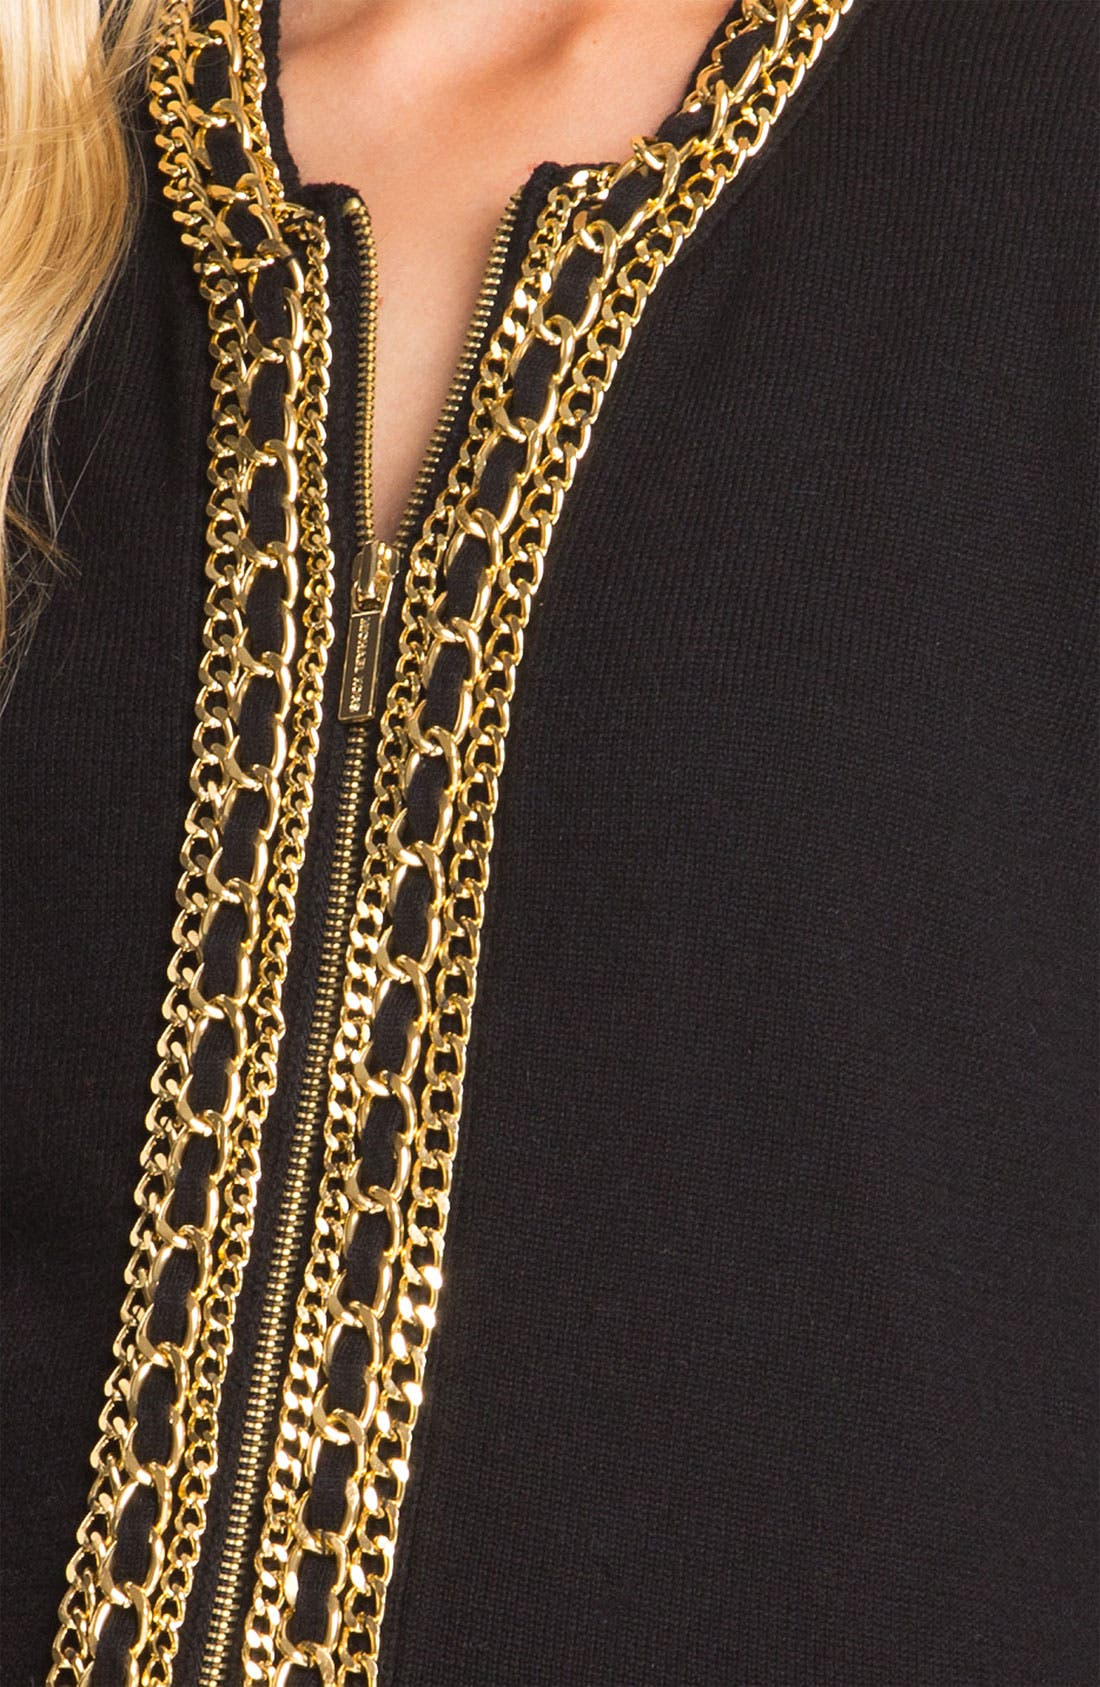 Alternate Image 3  - MICHAEL Michael Kors Chain Placket Cardigan (Petite)